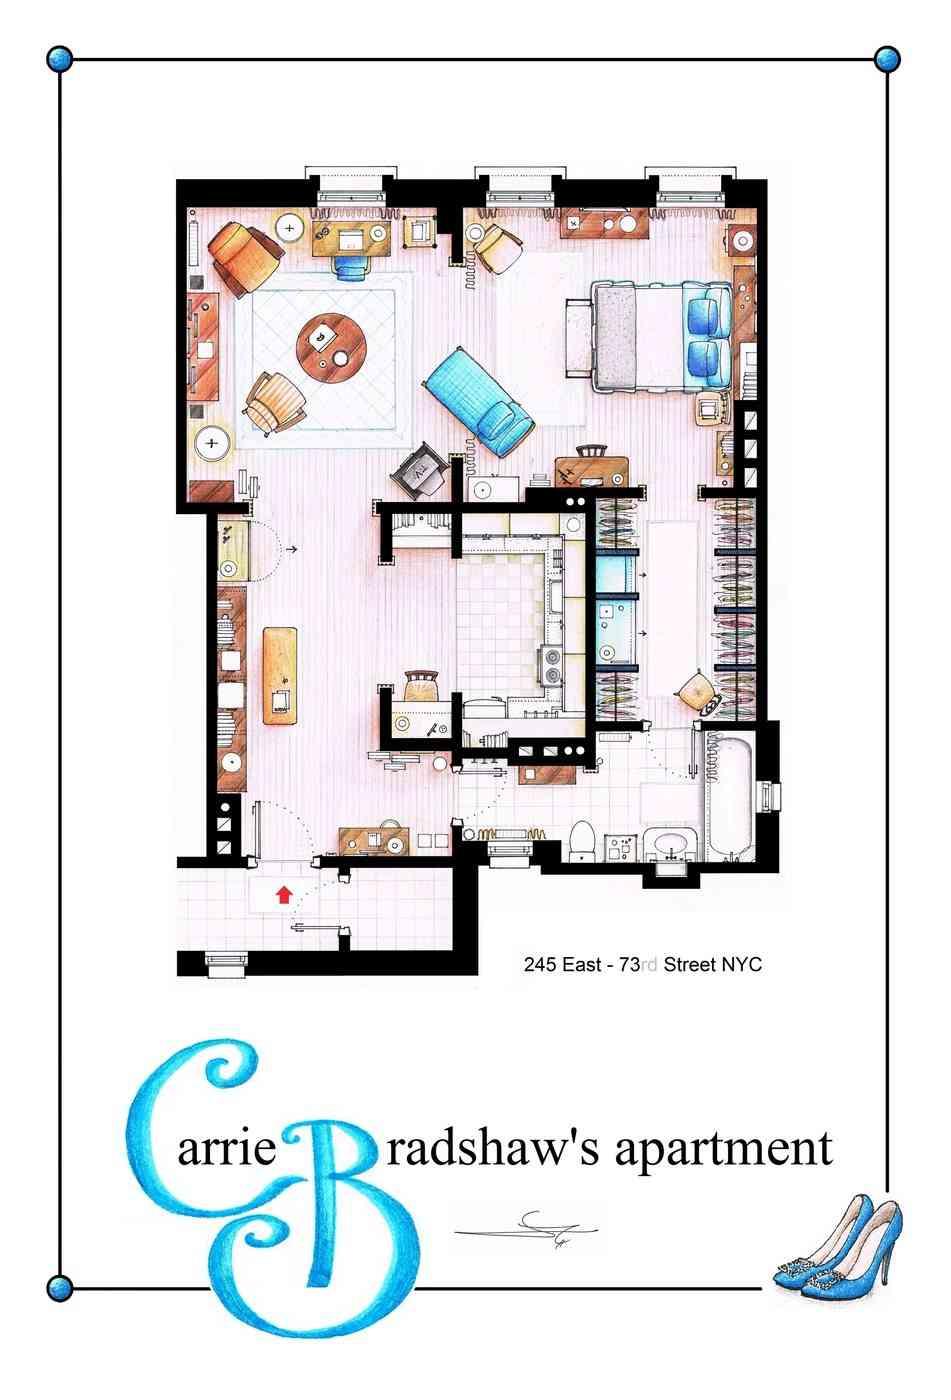 plano de piso de Carrie Bradshaw